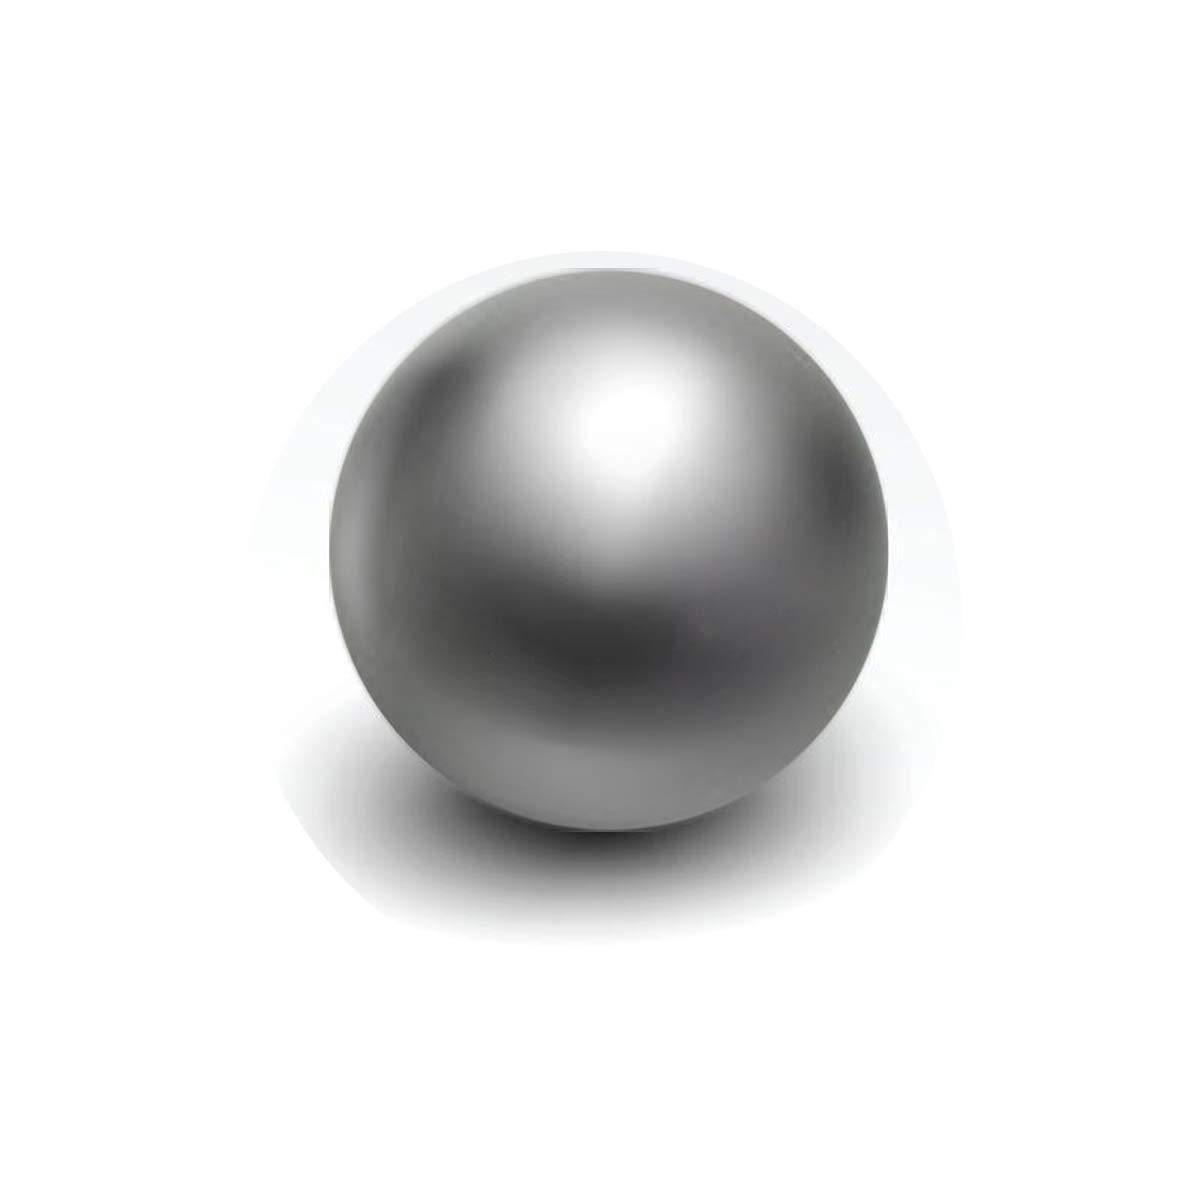 Tampa Mall 1pcs 3Inch Chrome Ball Bearing Steel Free shipping / New